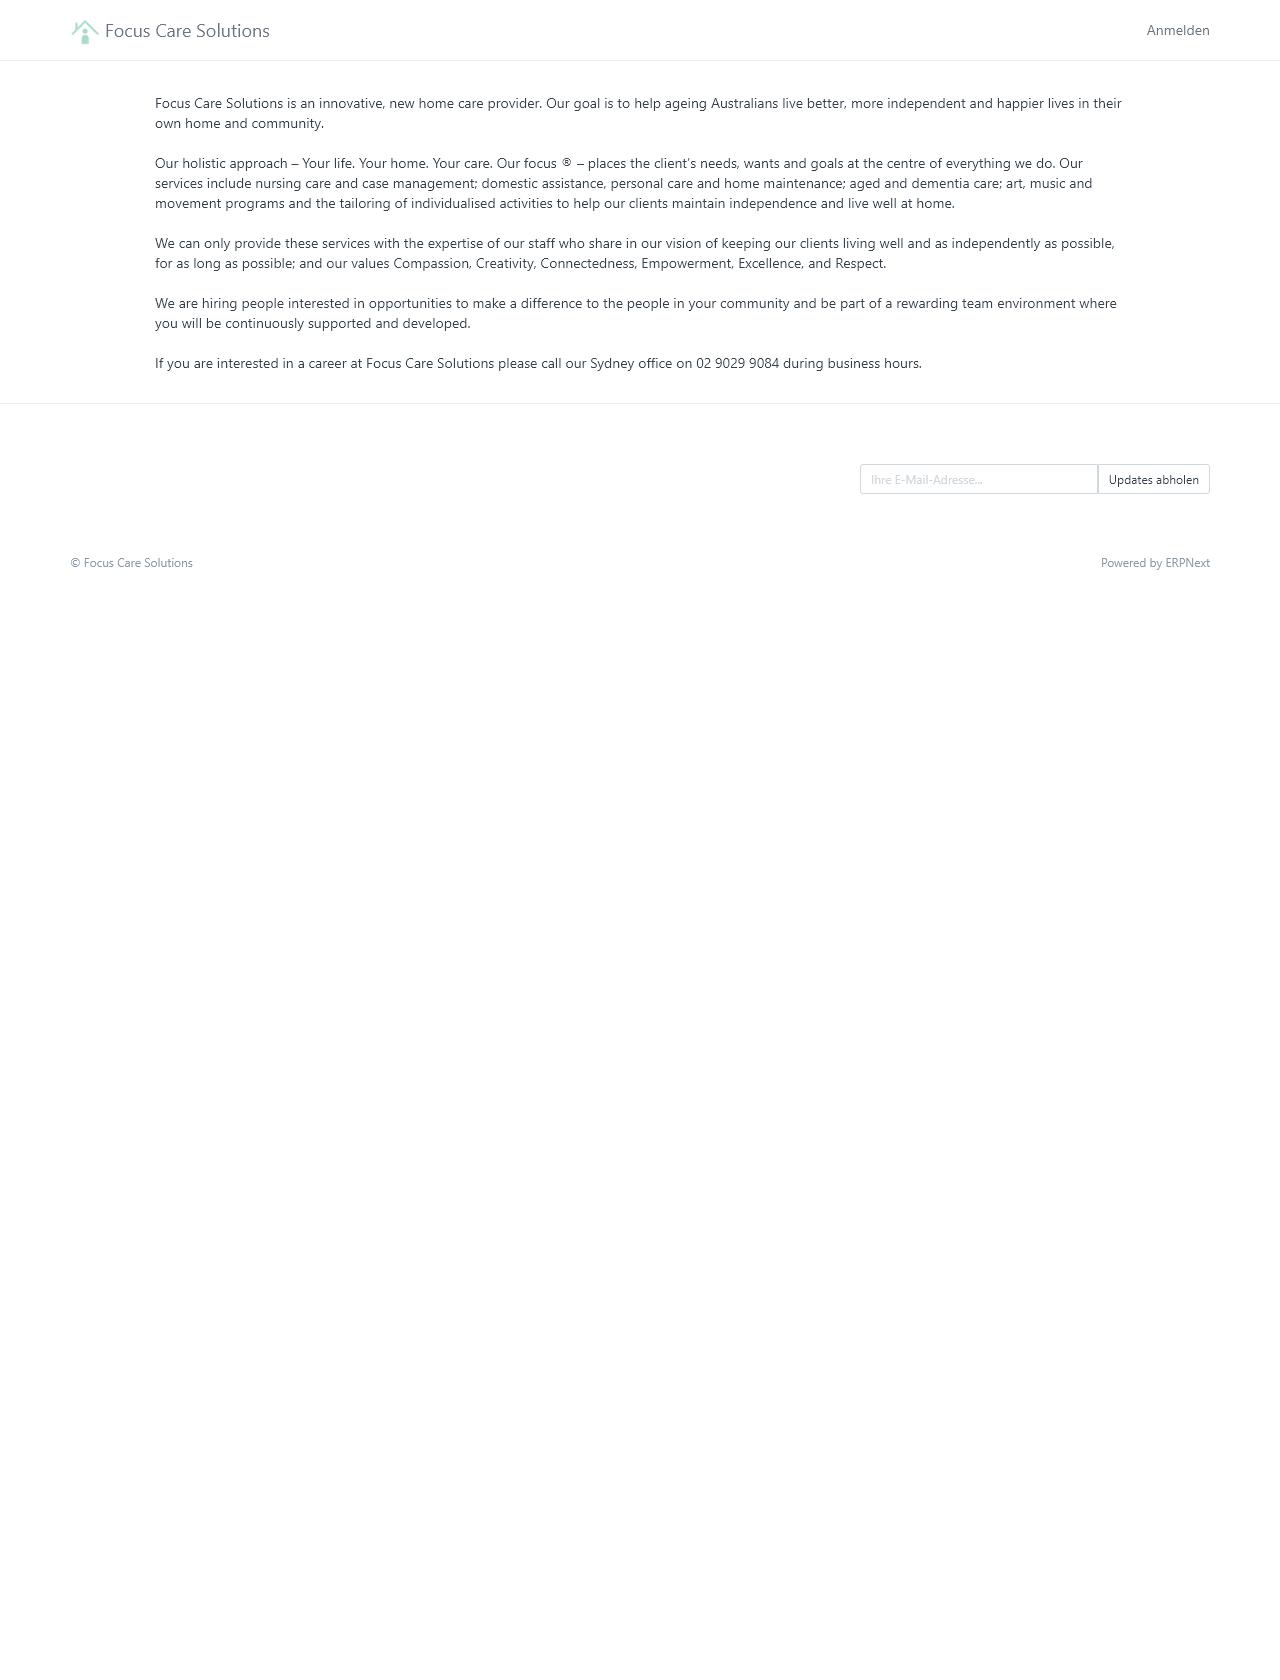 Screenshot Desktop - https://focuscareaustralia.com.au/